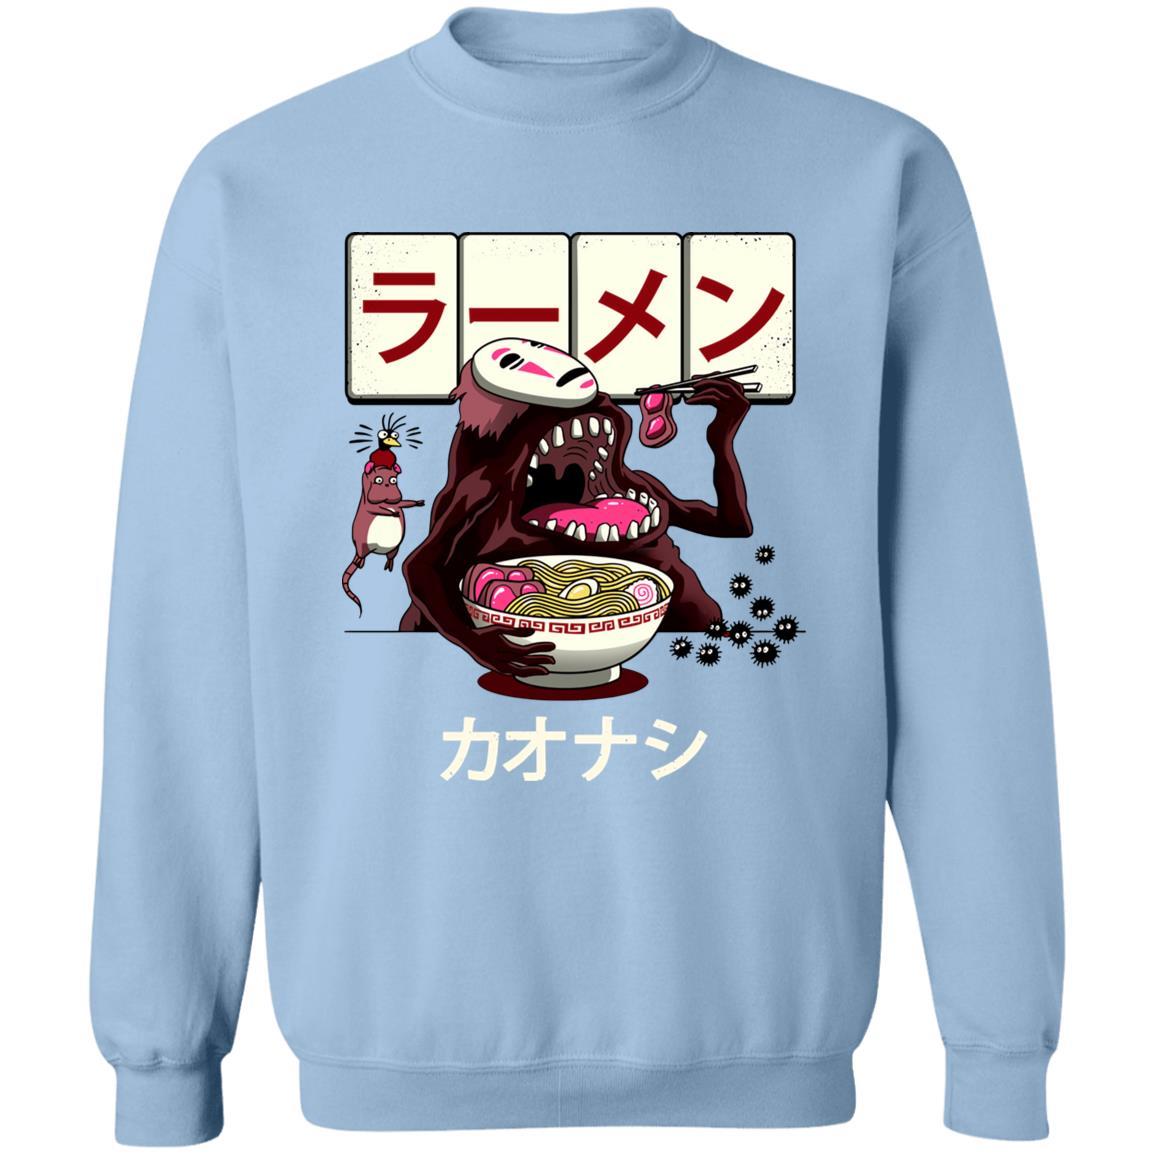 Spirited Away Kaonashi Ramen Sweatshirt